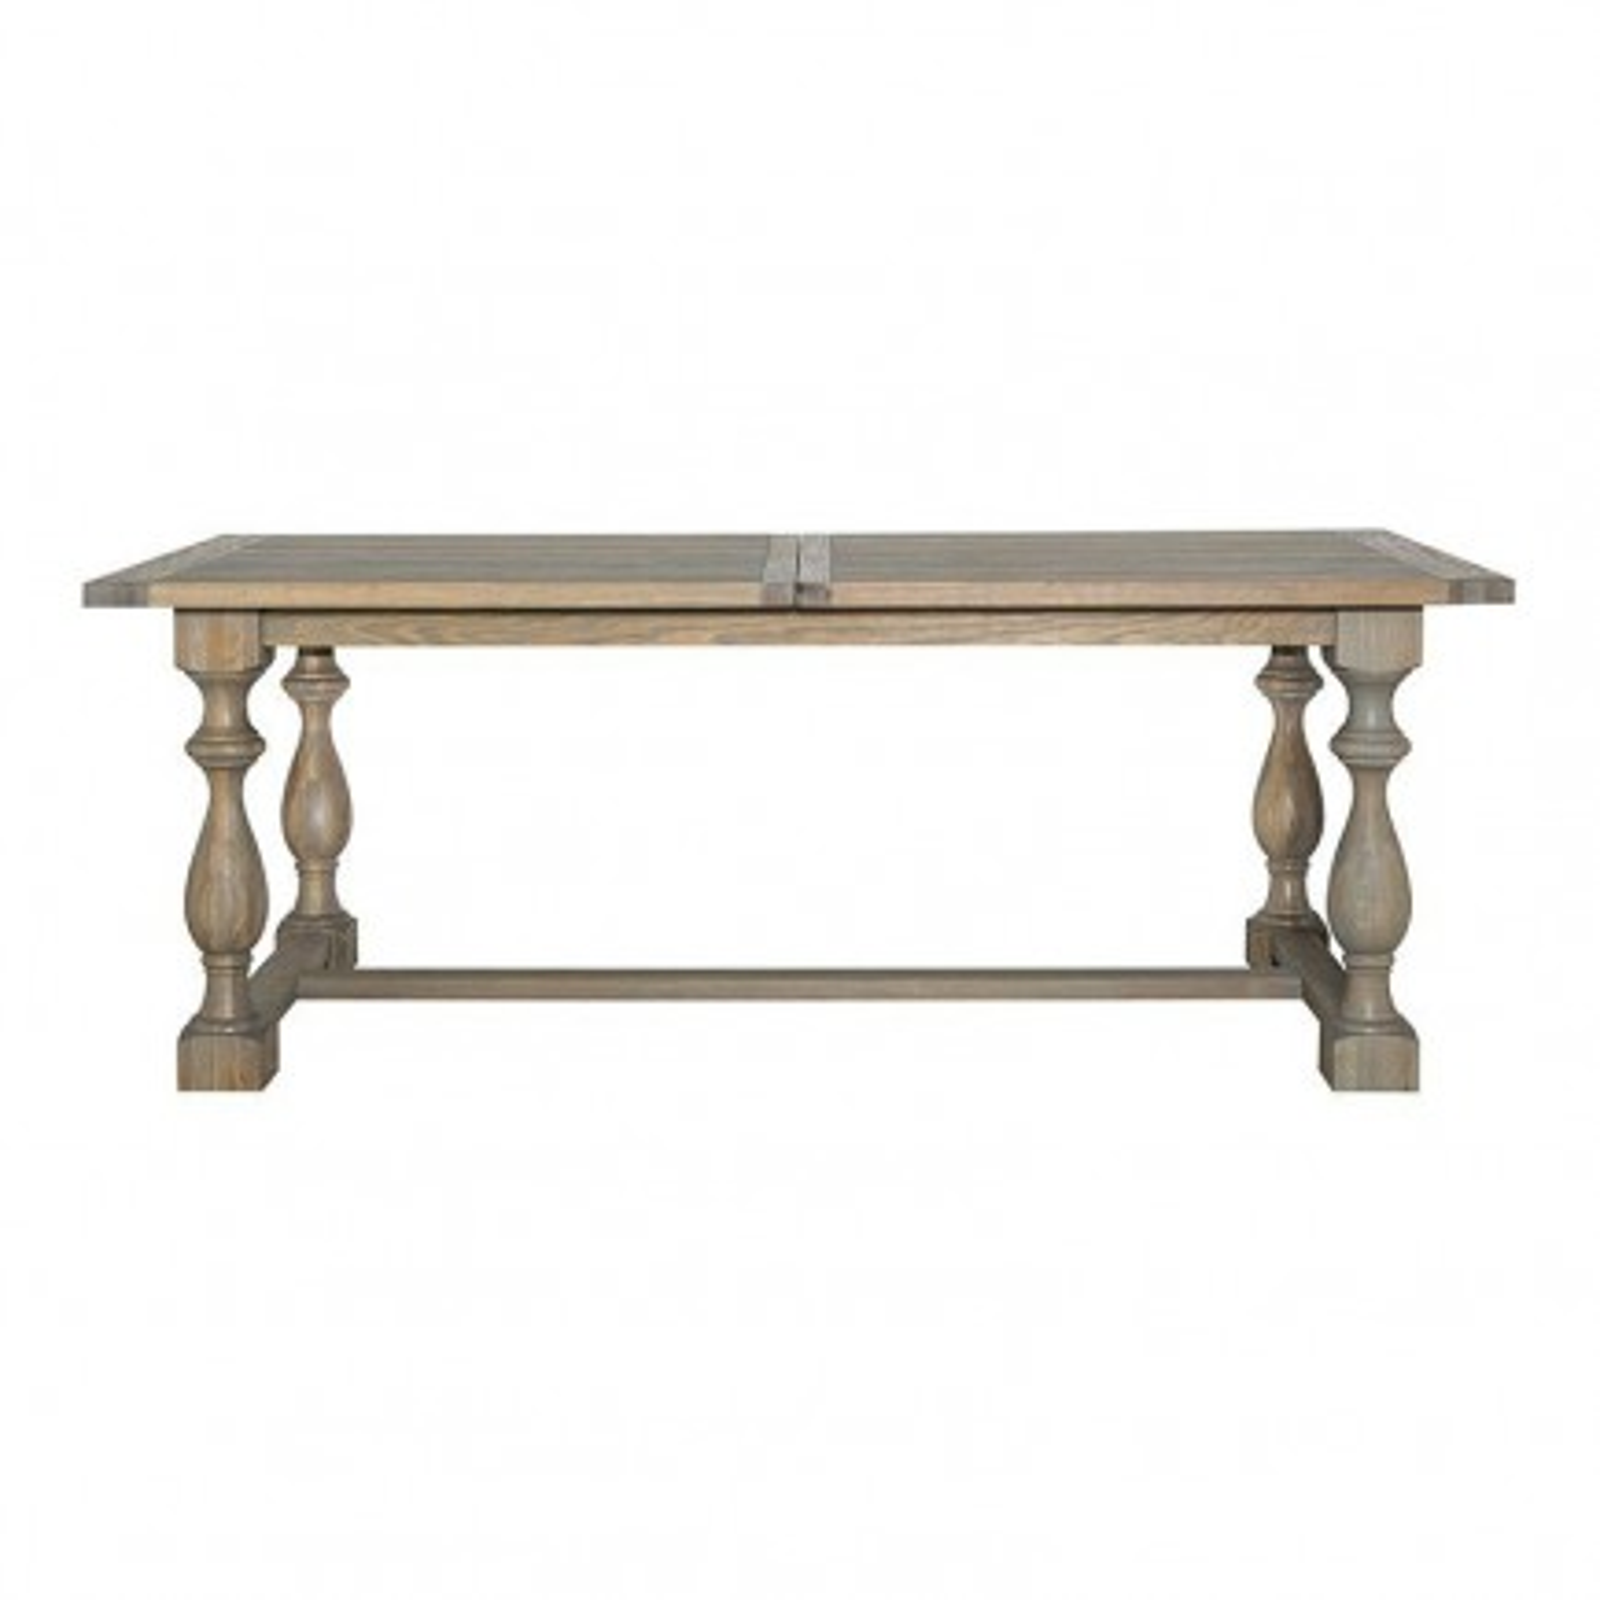 Table de salle rallonge Versaille Victoria Chêne Massif - achat table